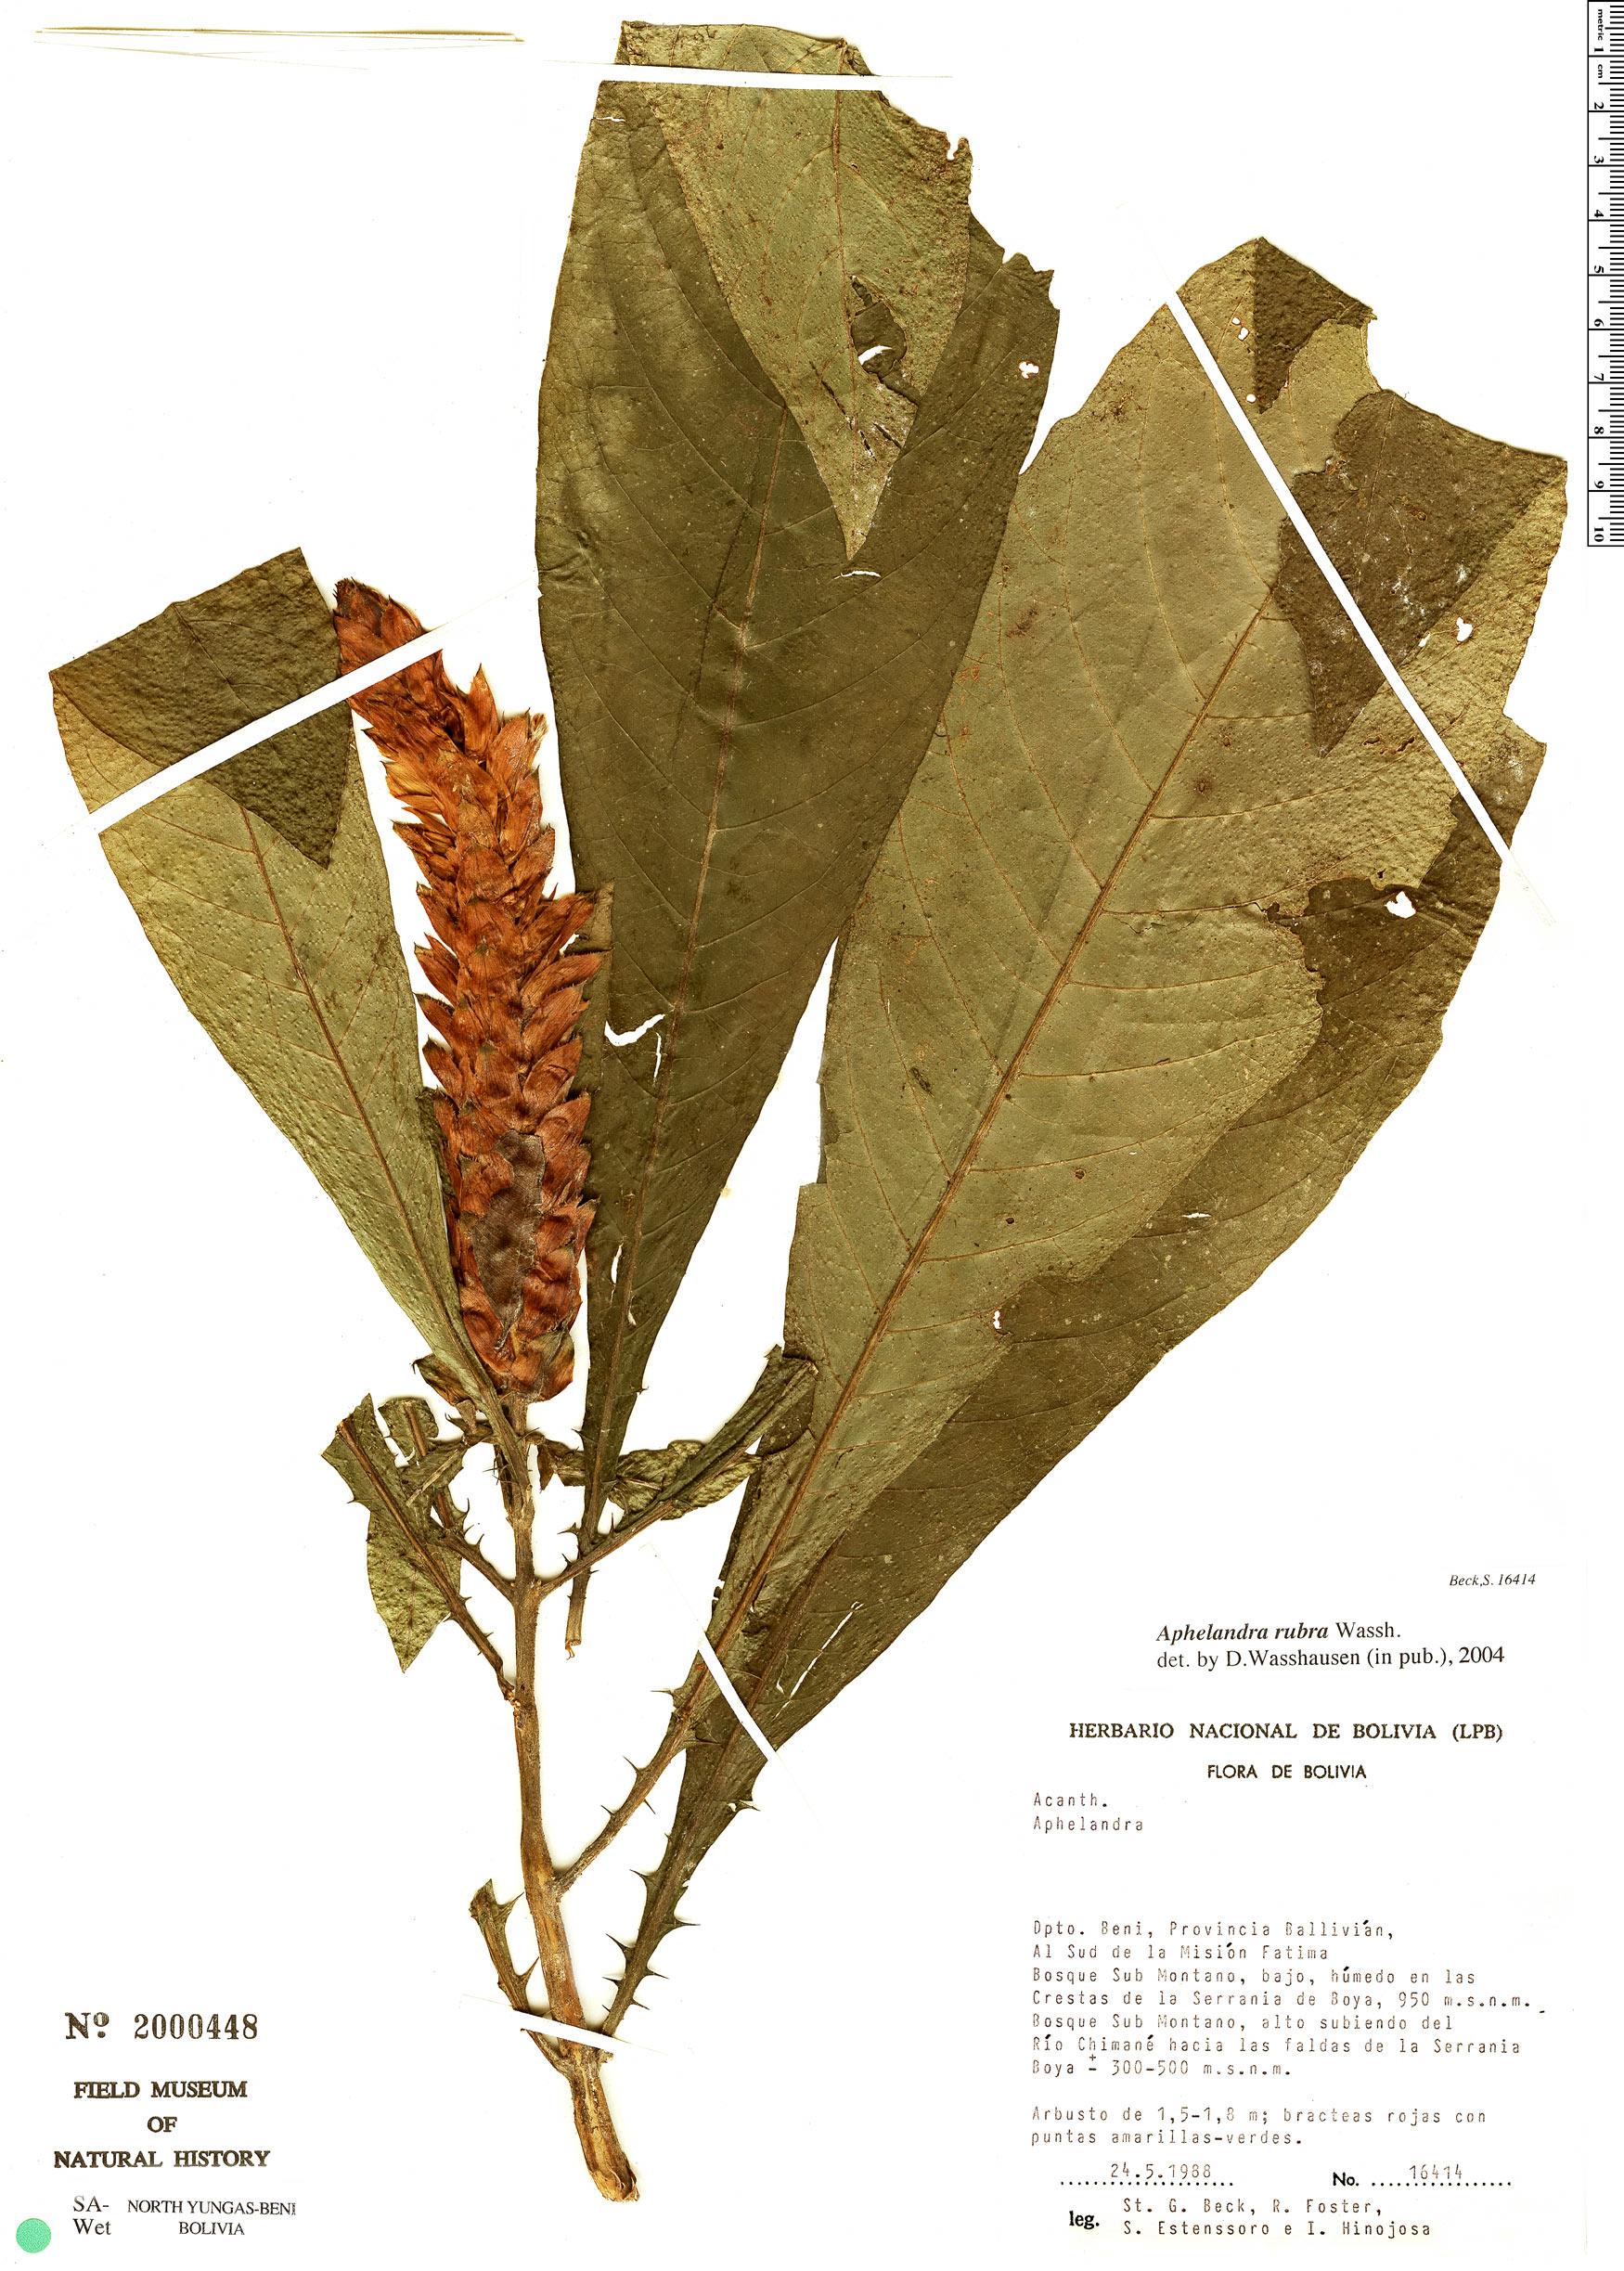 Specimen: Aphelandra rubra